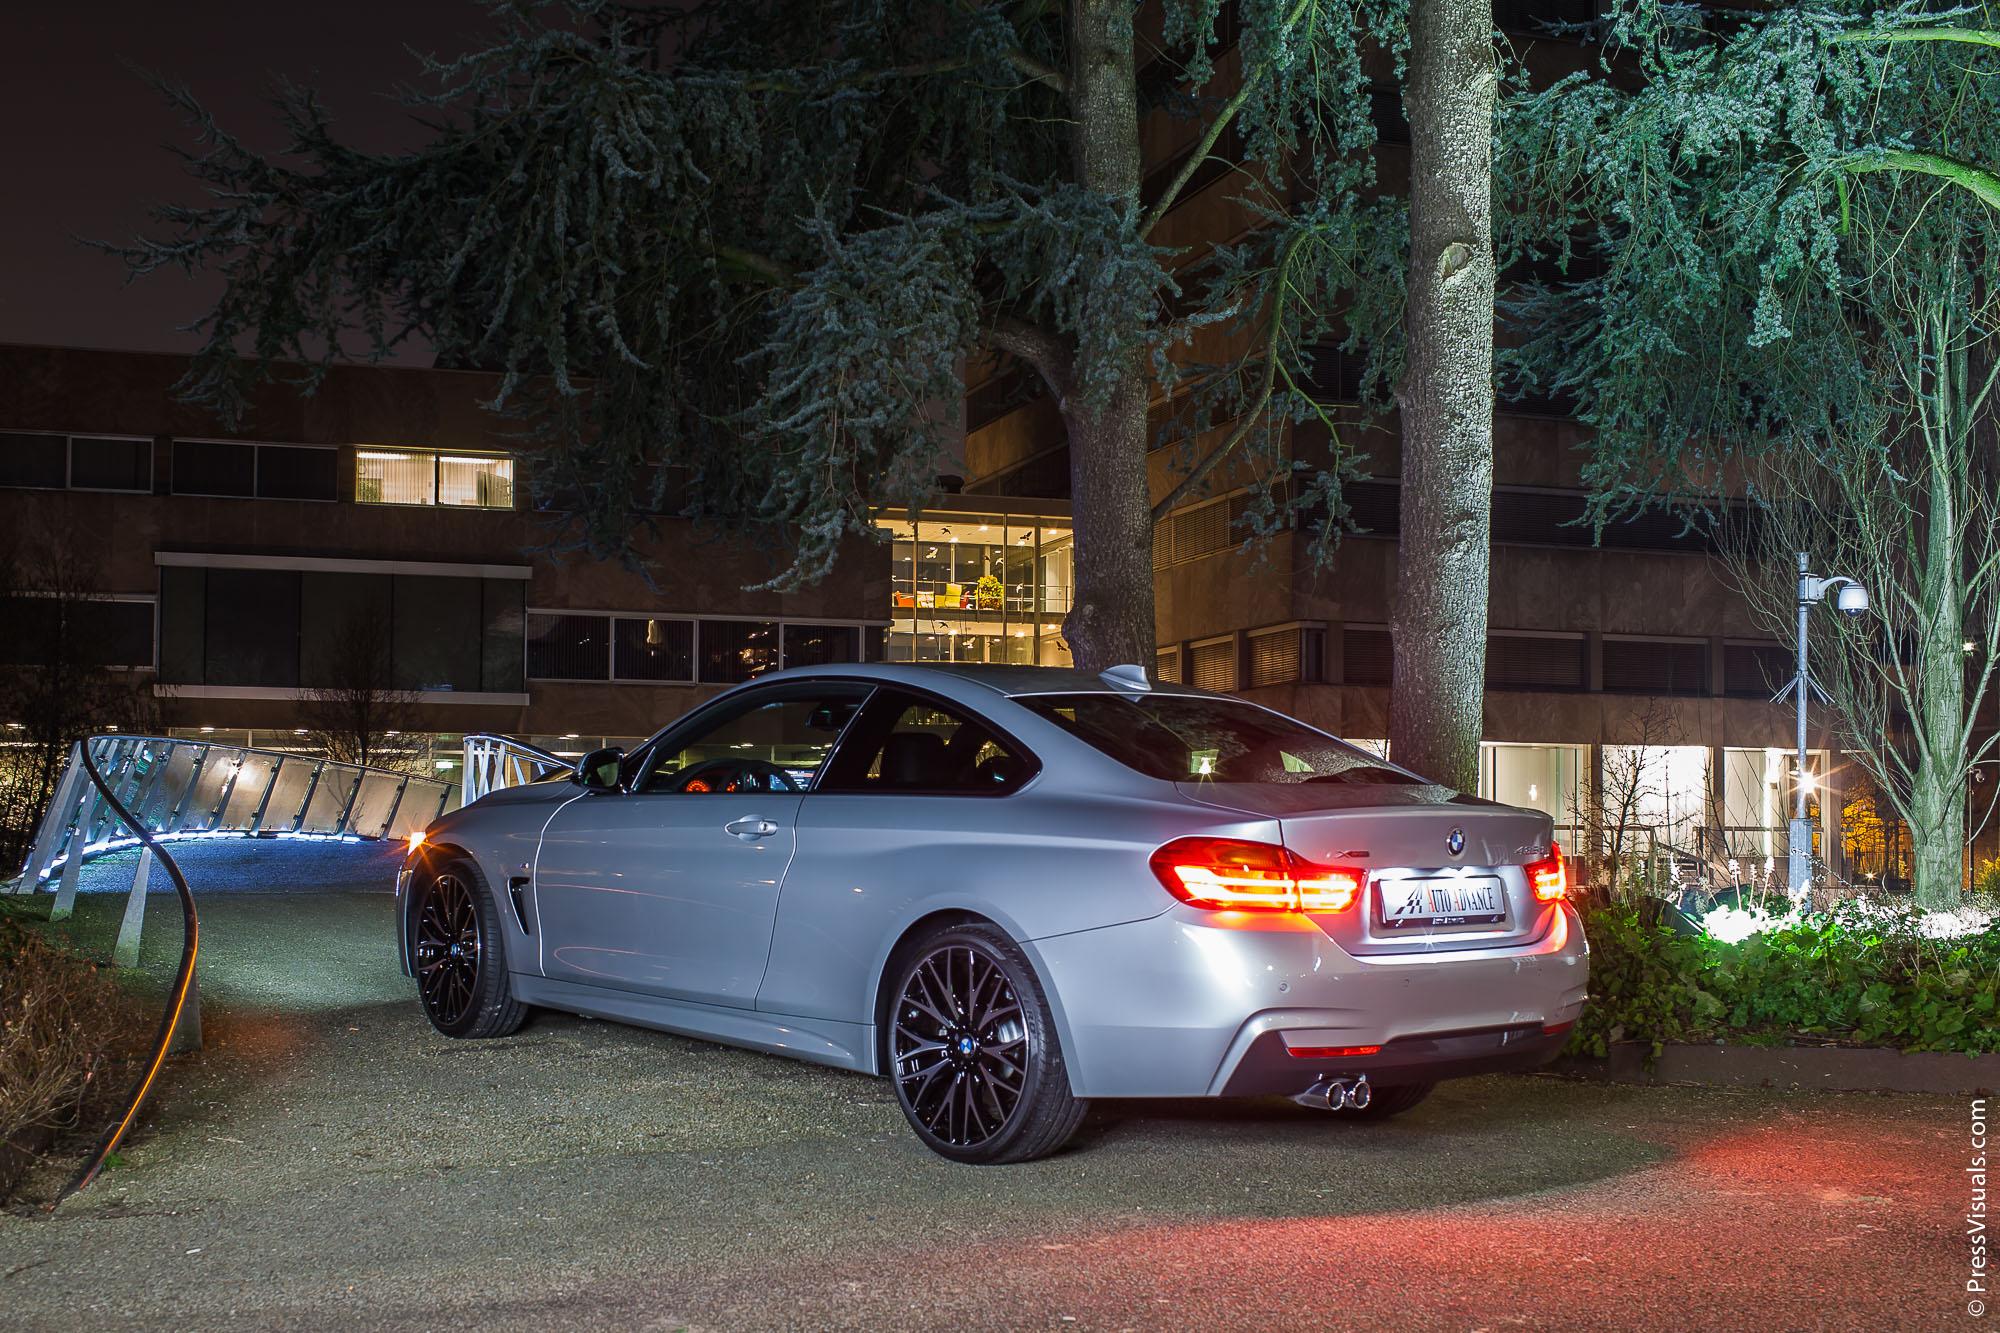 BMW 435d xDrive M-sportpakket | Auto Advance | Van Abbemuseum Eindhoven